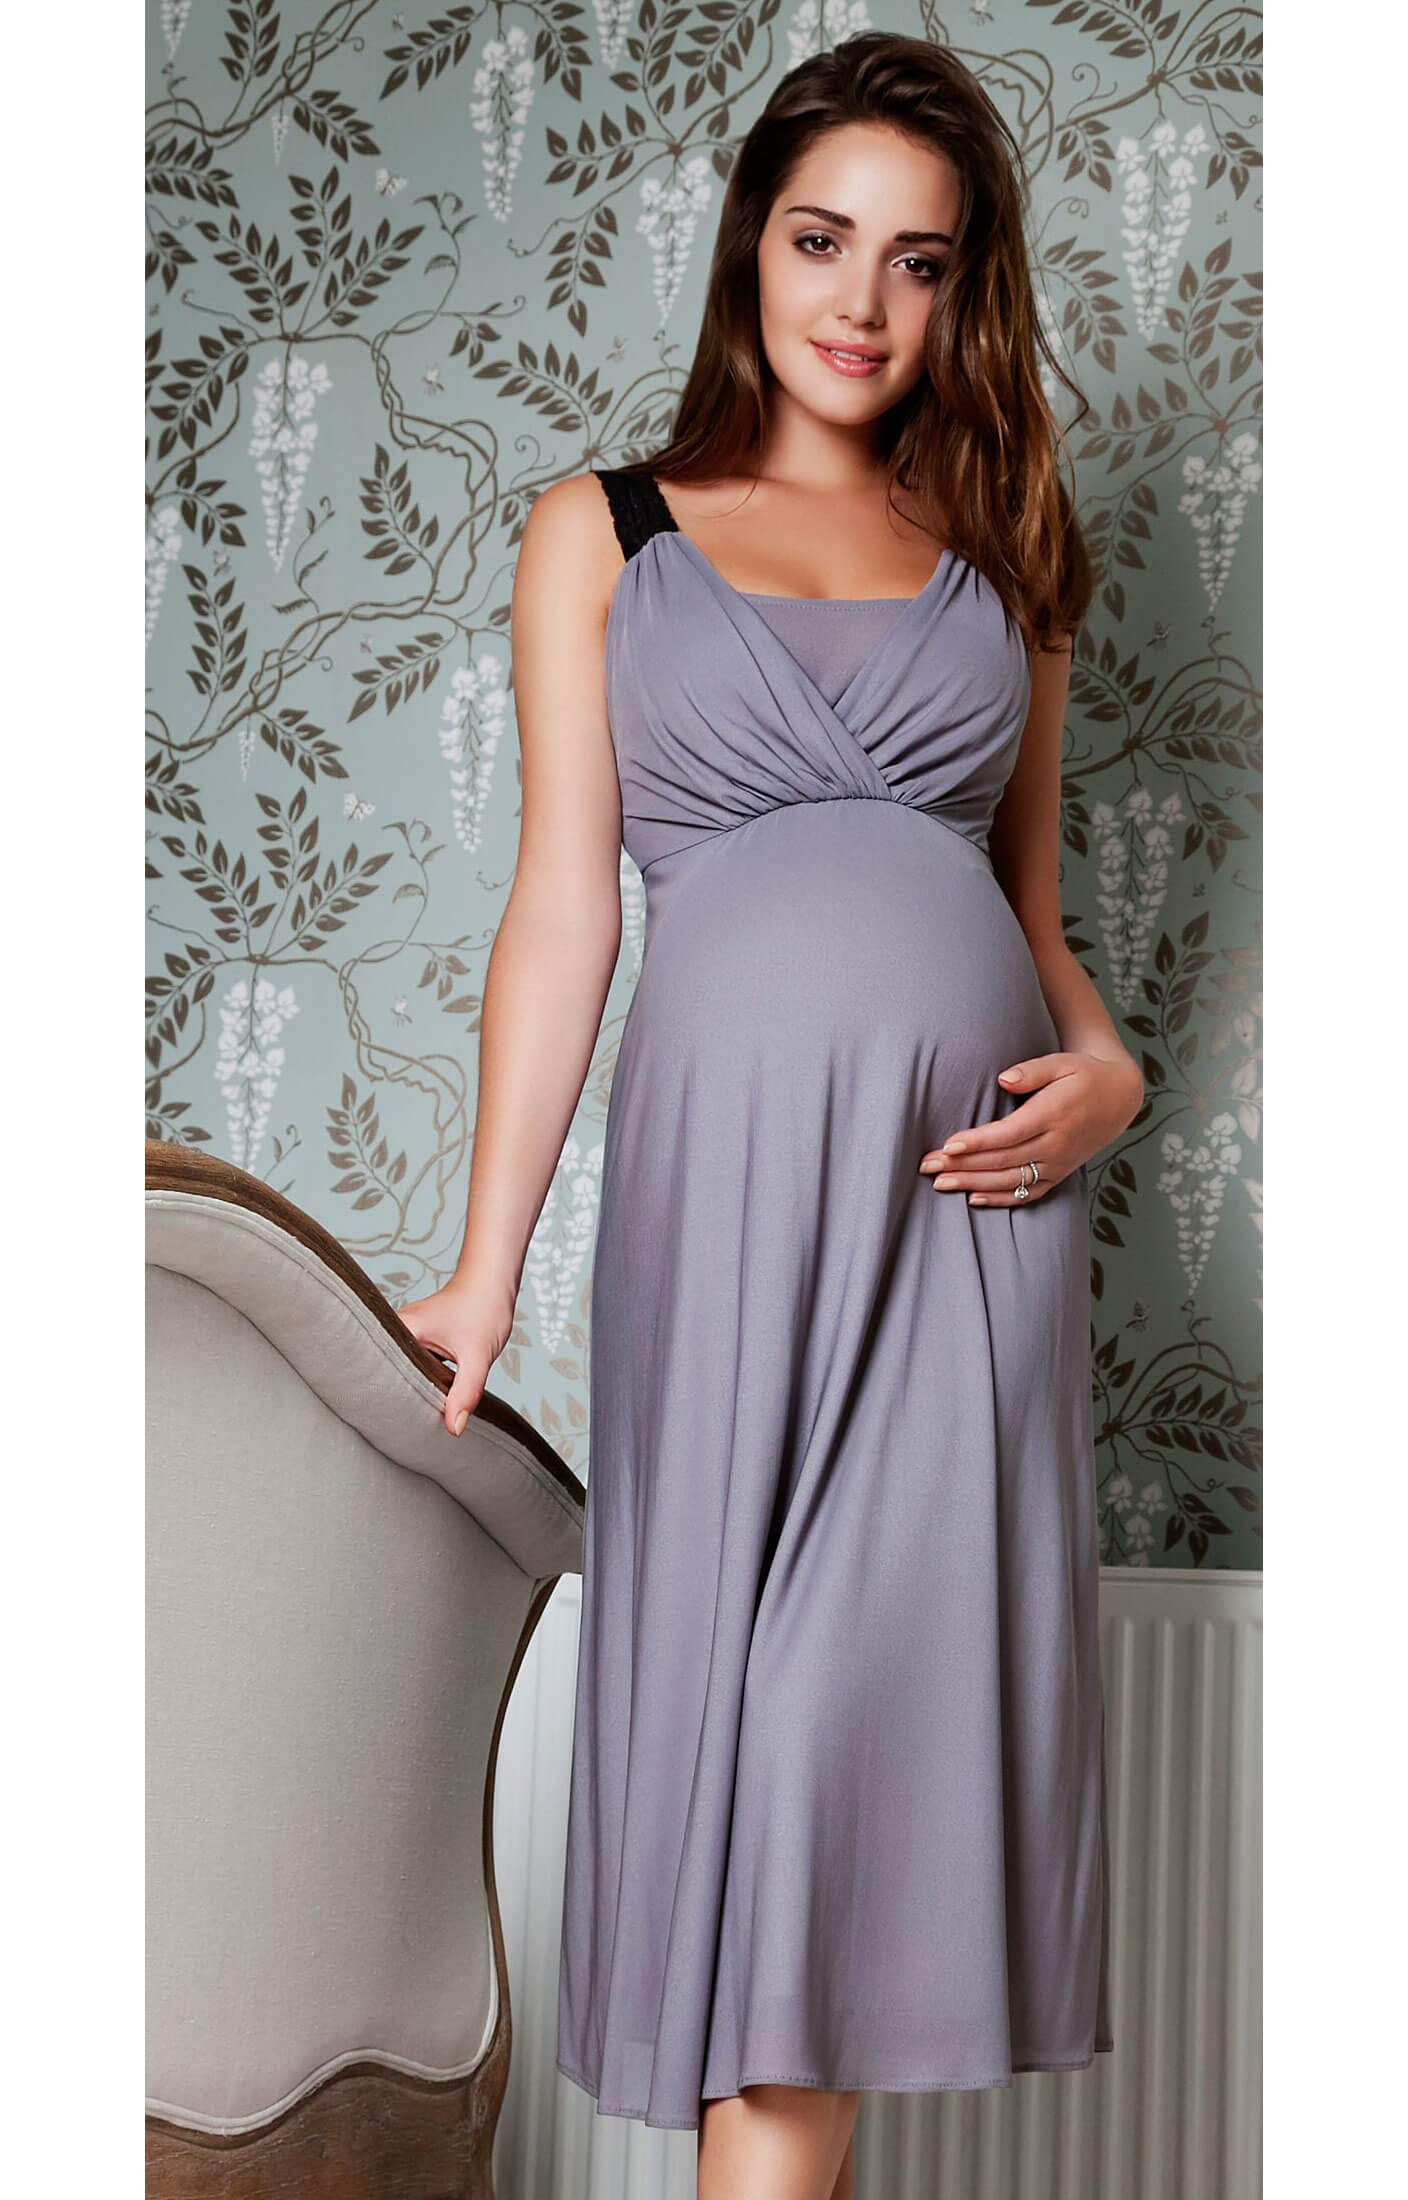 Wedding Night Gowns  Luella Maternity Night Gown Maternity Wedding Dresses